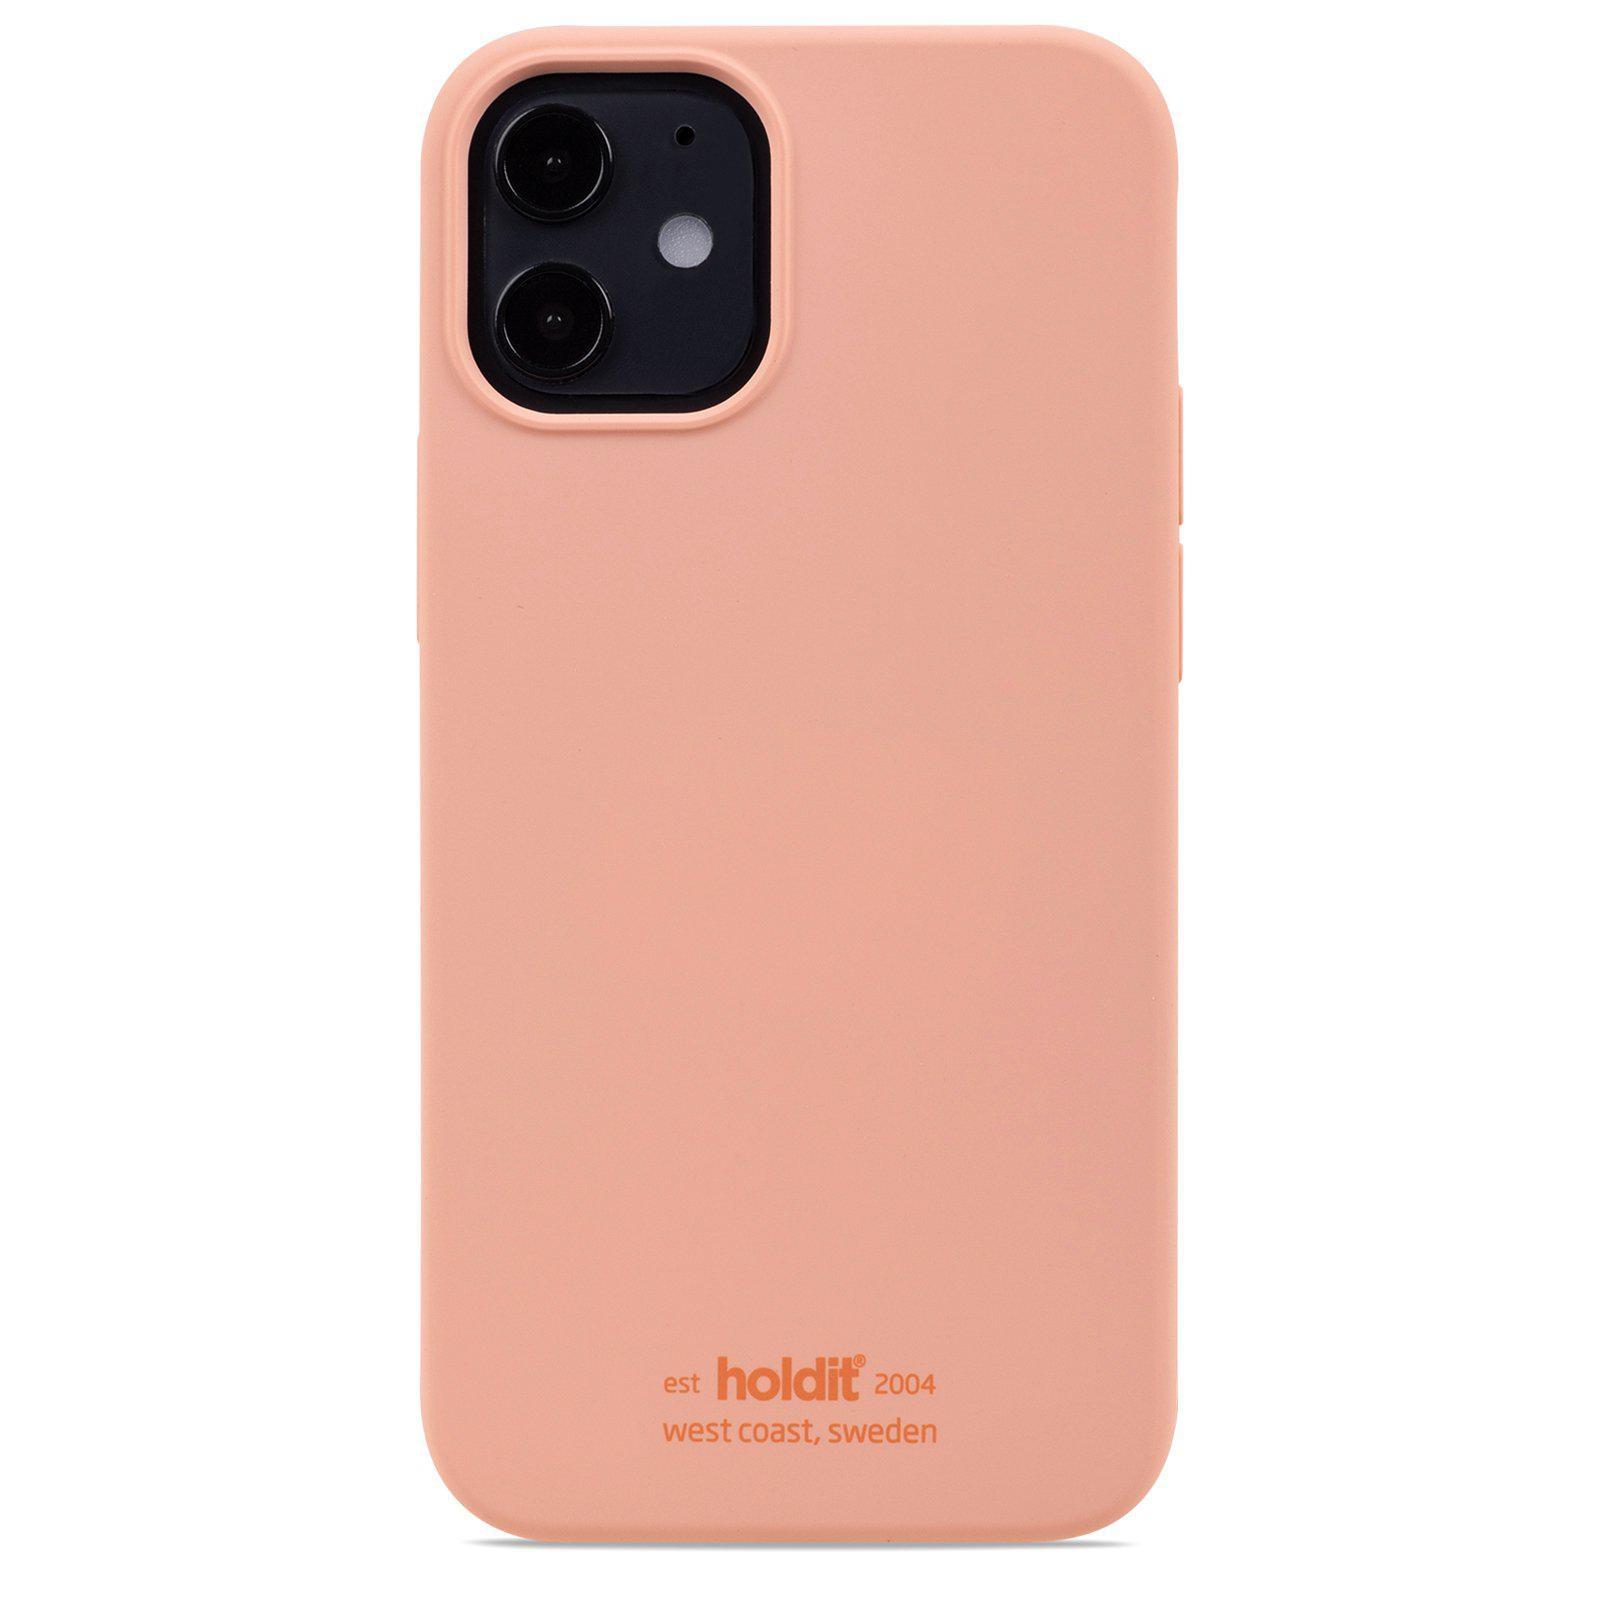 Silikonskal iPhone 12 Mini Pink Peach